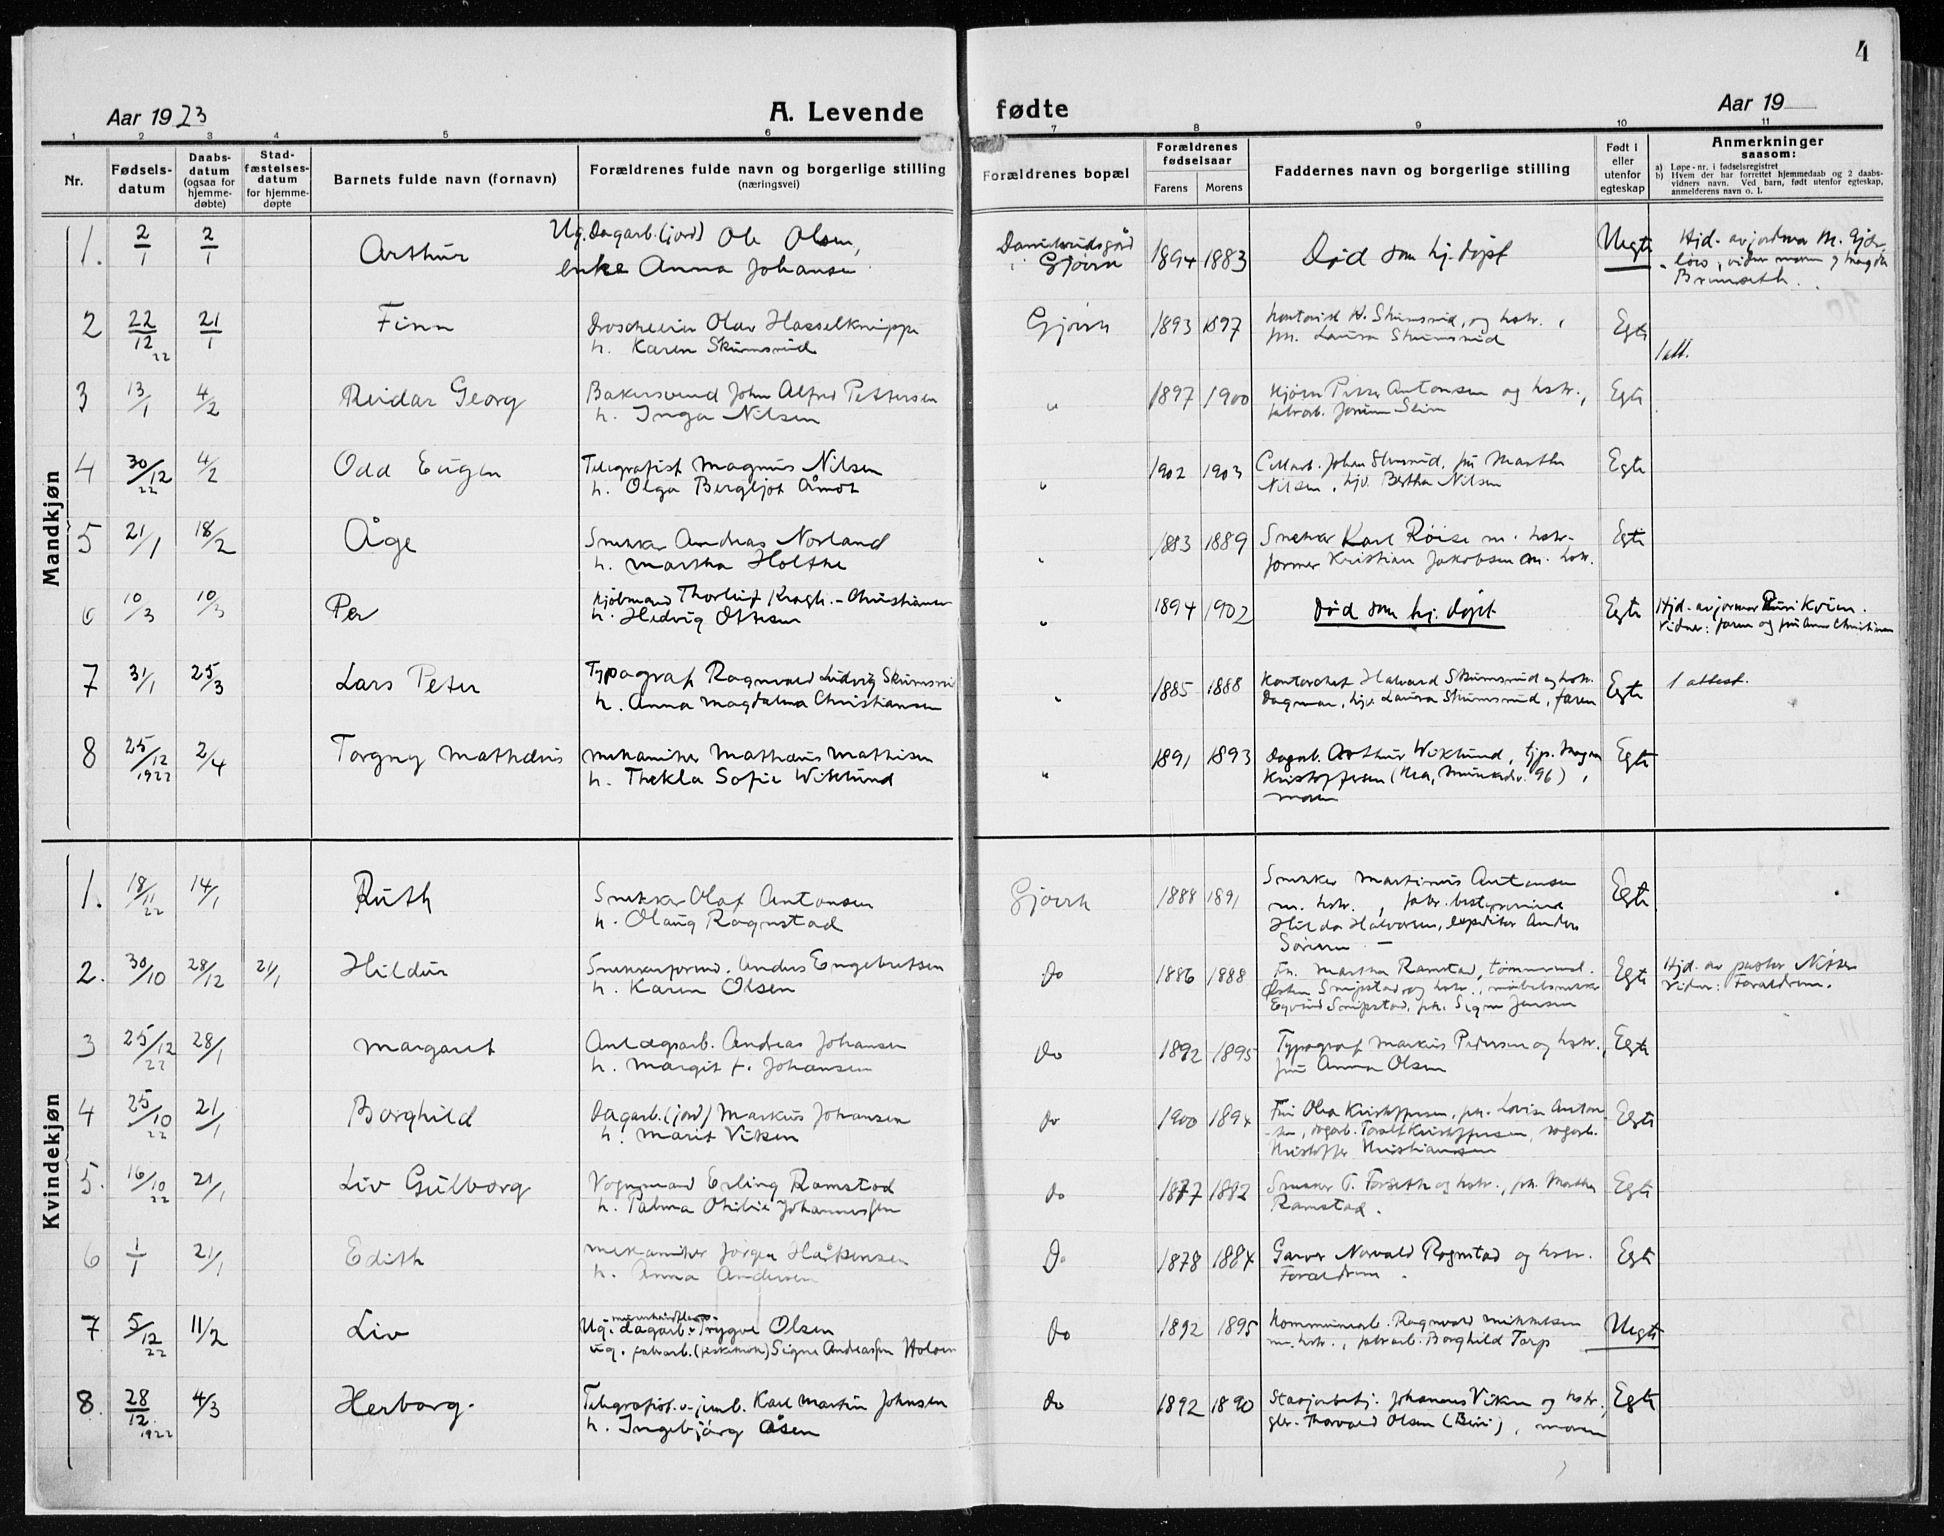 SAH, Vardal prestekontor, H/Ha/Haa/L0015: Ministerialbok nr. 15, 1923-1937, s. 4